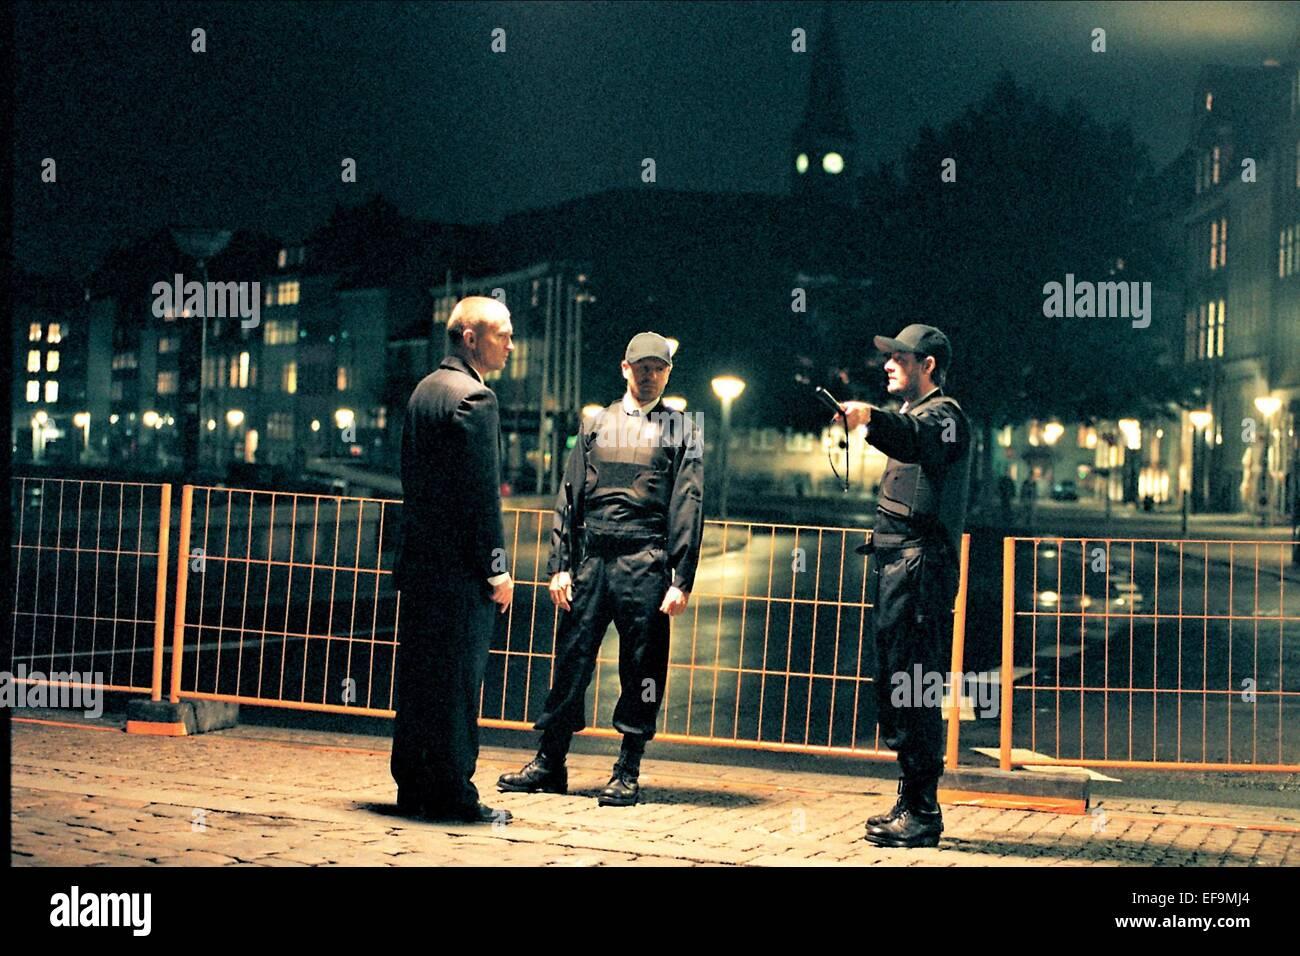 ULRICH THOMSEN ALLEGRO (2005) Immagini Stock